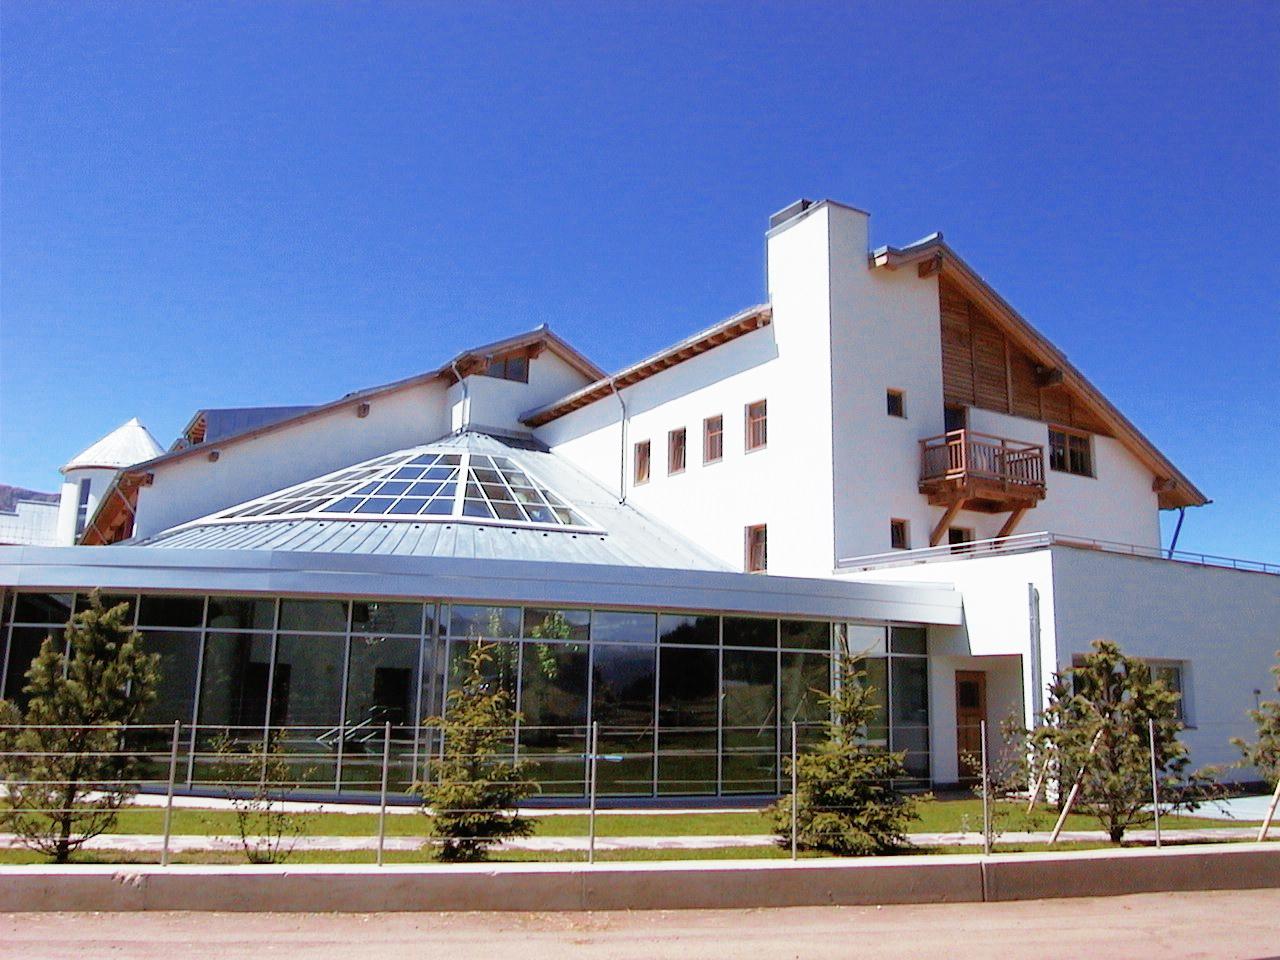 Hotel Urtaler Hotel Urtaler